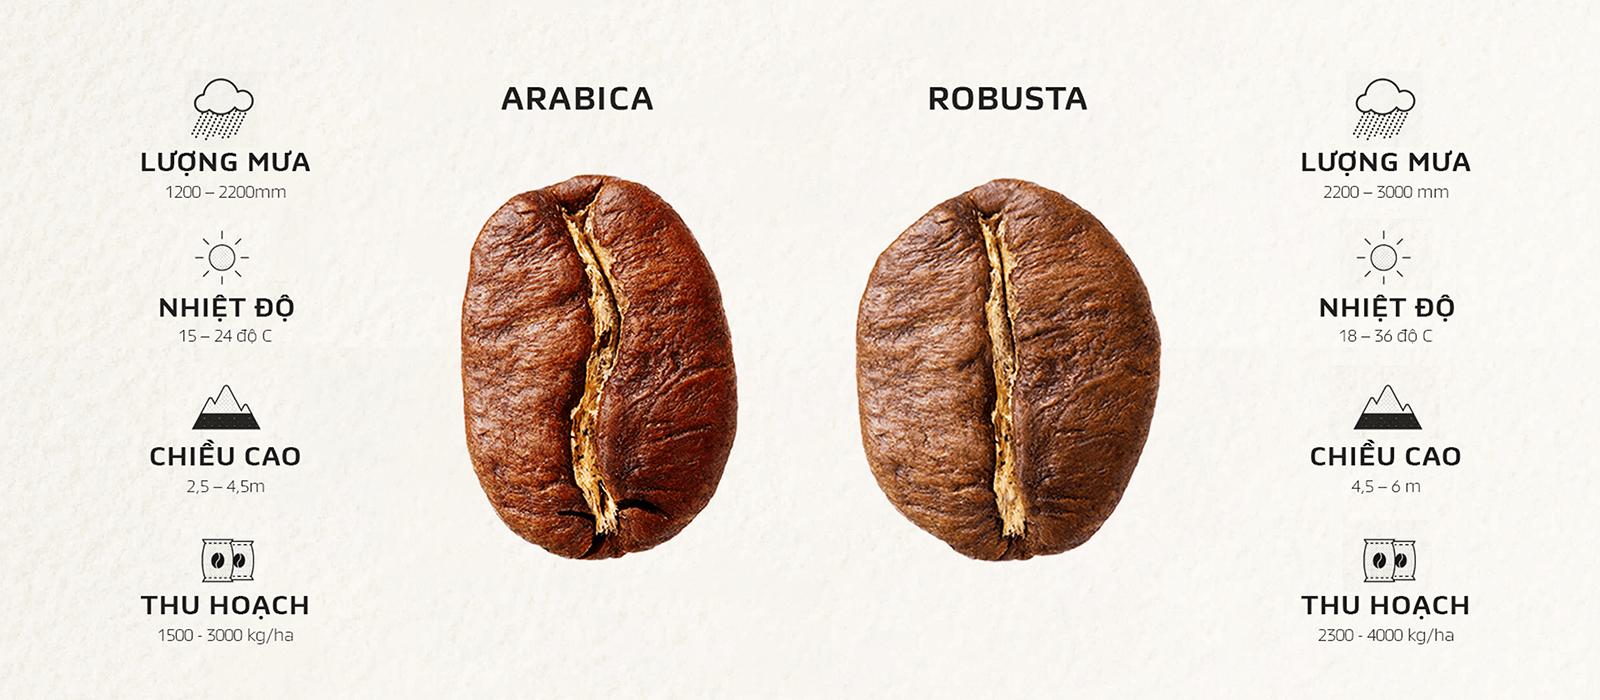 Arabica with Robusta